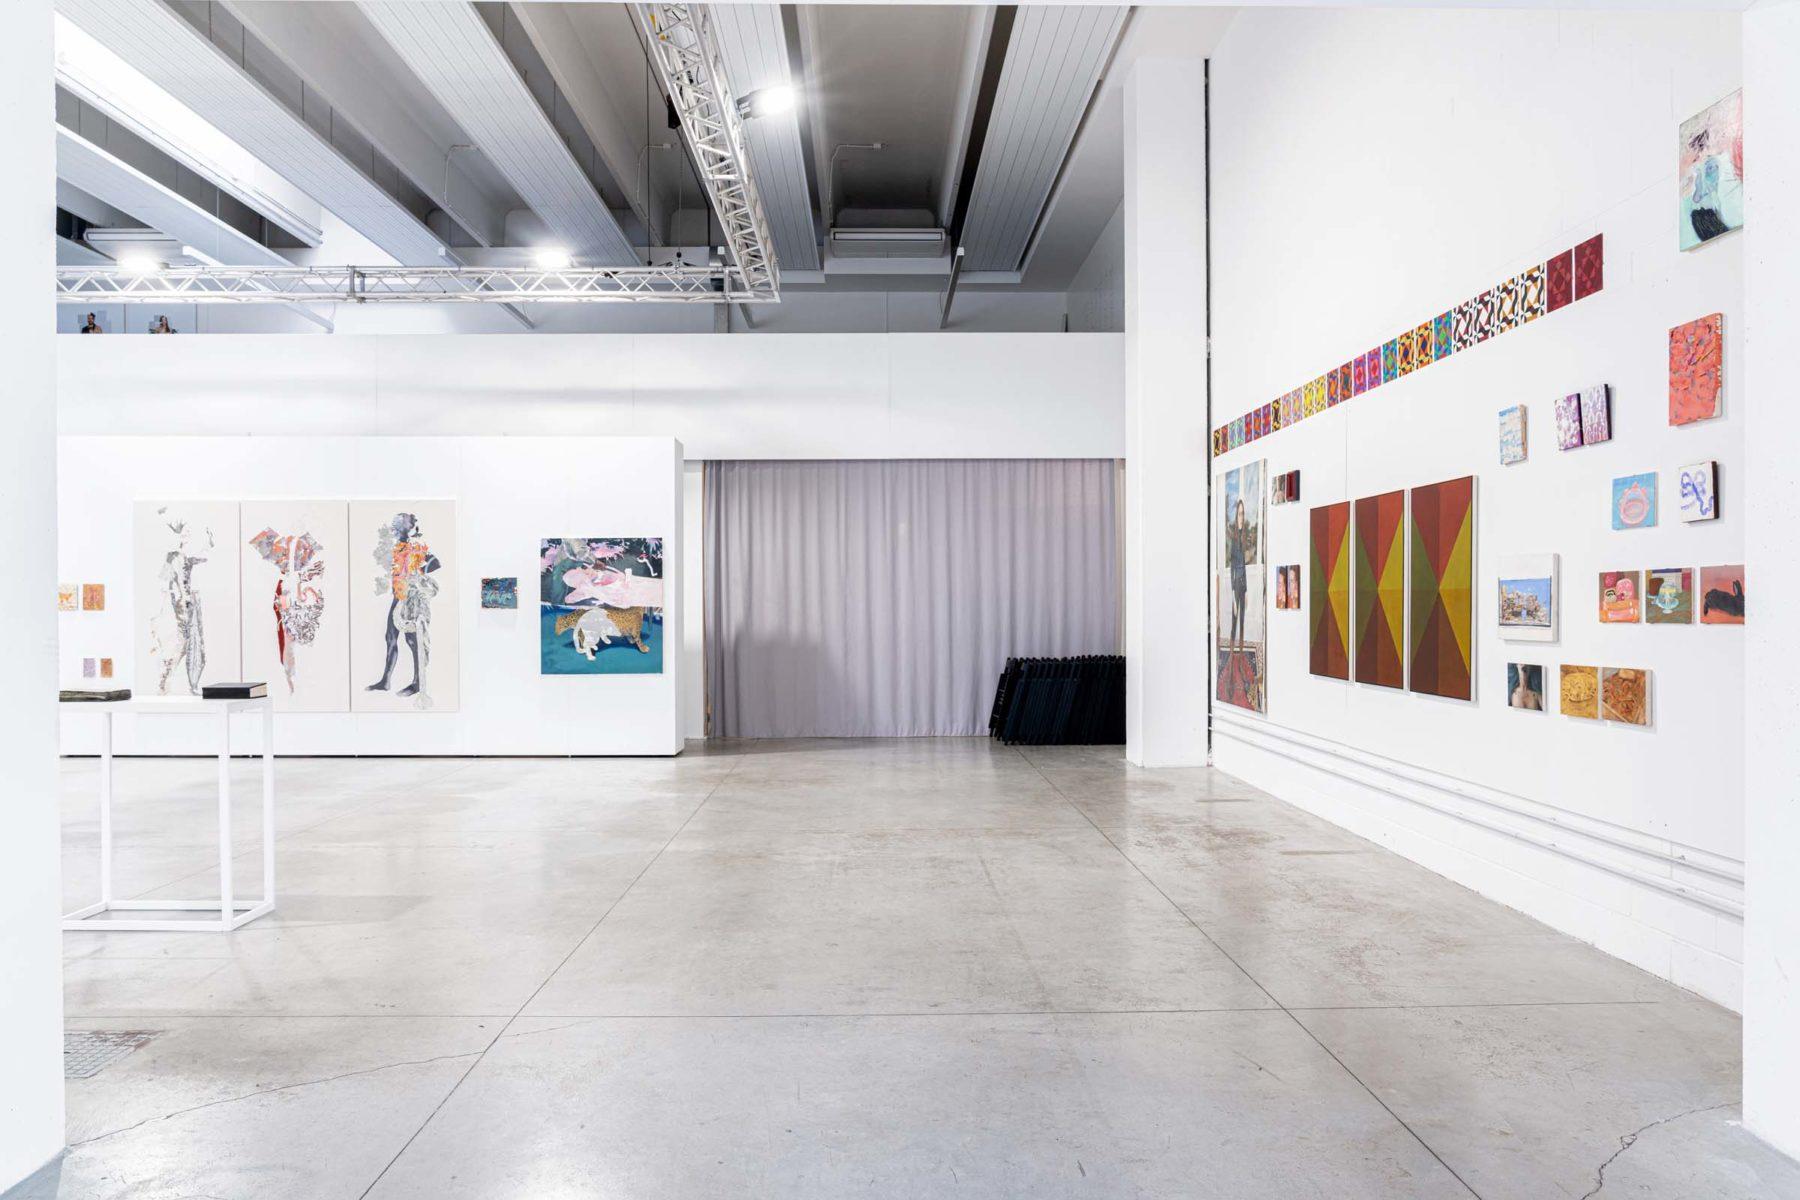 Extra Ordinario Appello, 2020, installation view, Vulcano, Venezia Marghera, ph. N.Covre